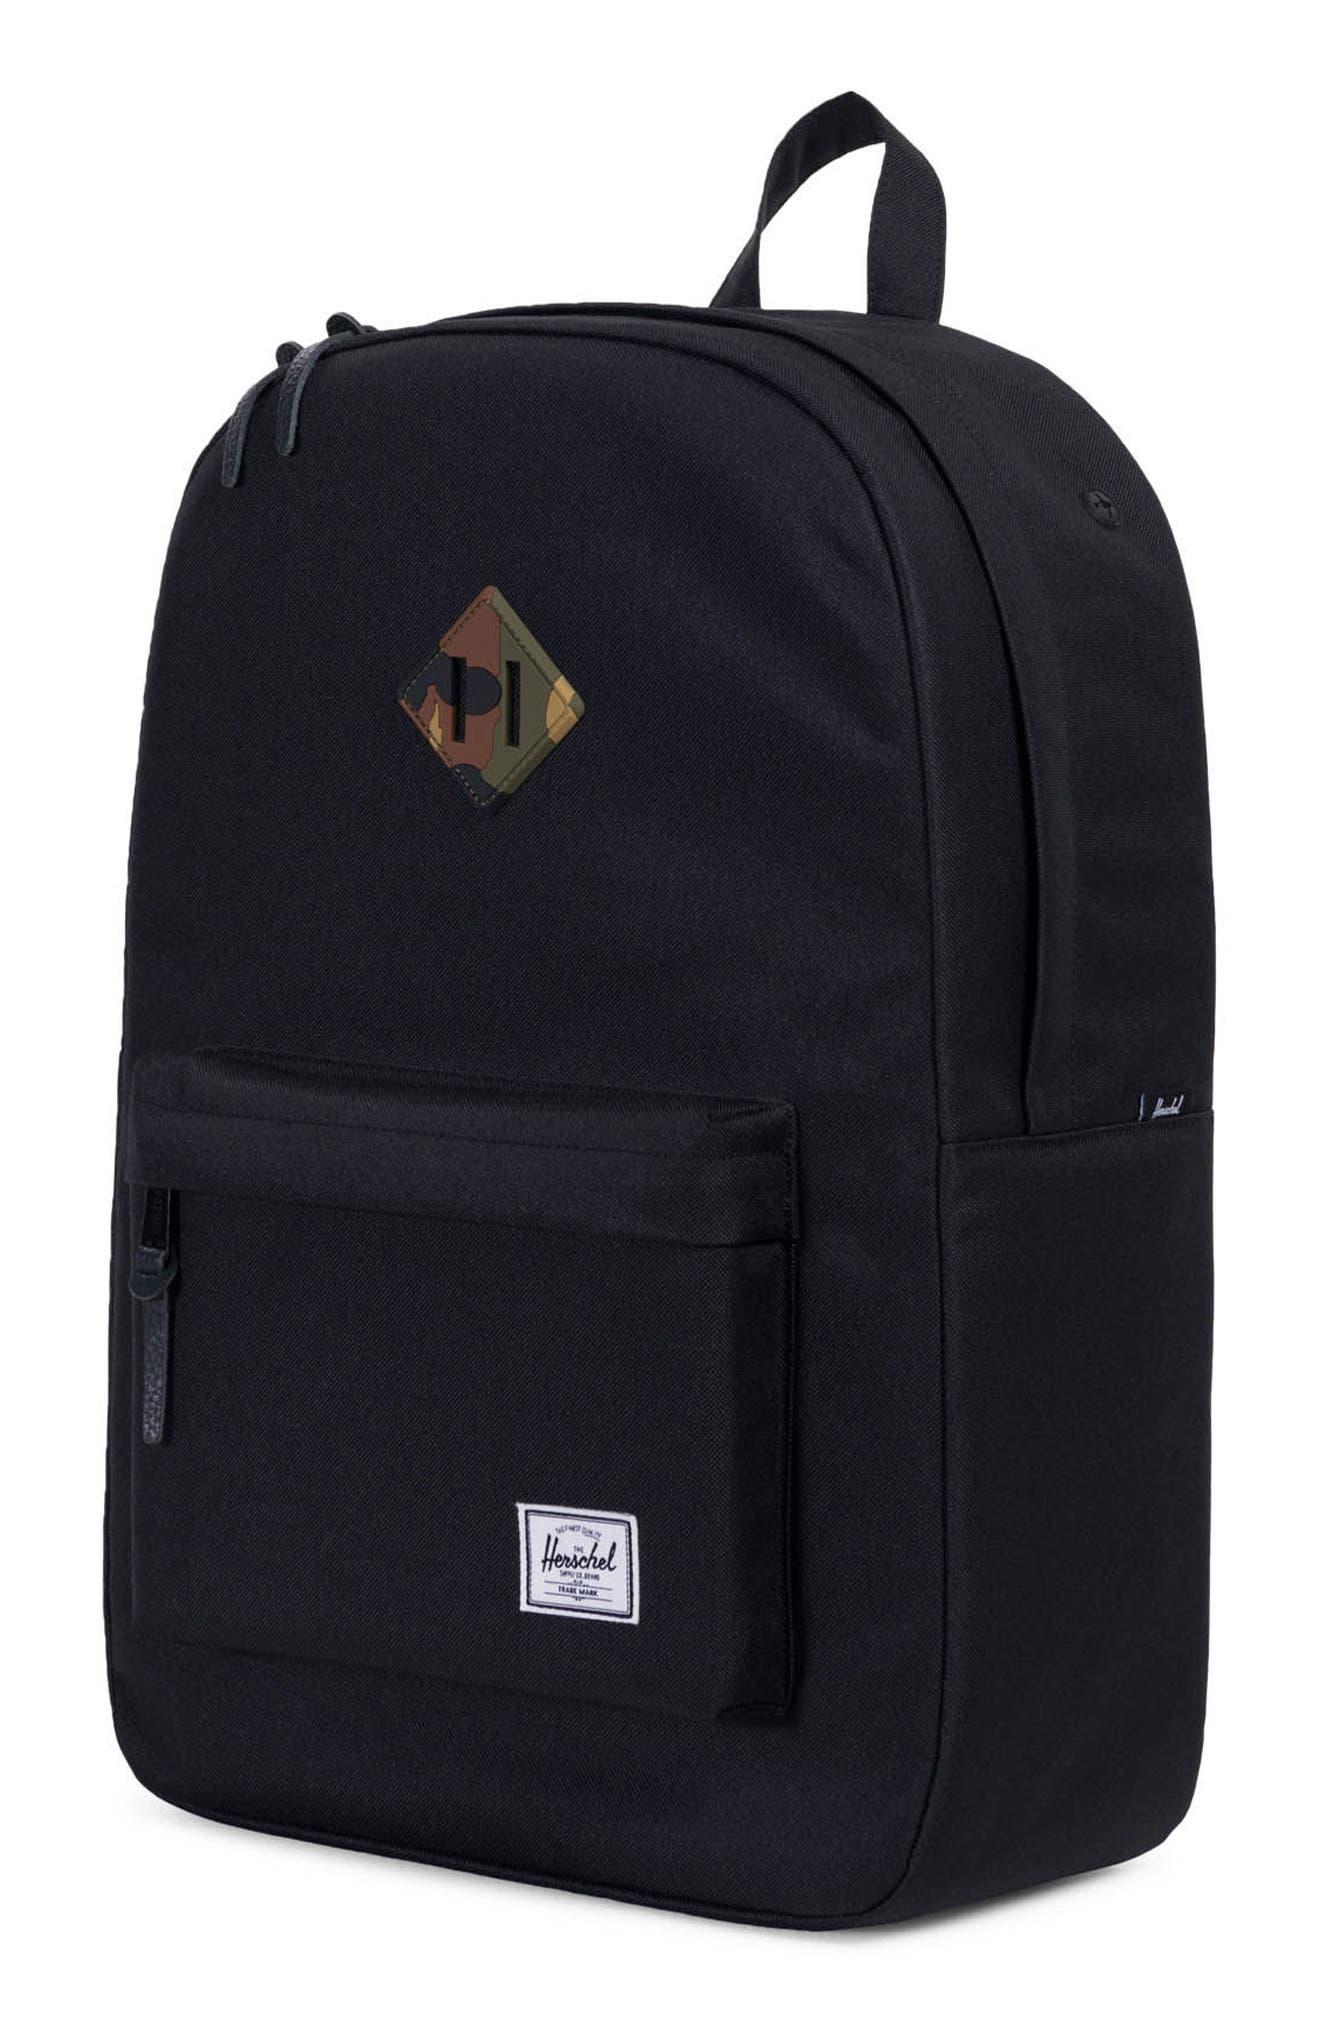 Heritage Reflective Backpack,                             Alternate thumbnail 4, color,                             Black/ Woodland Camo